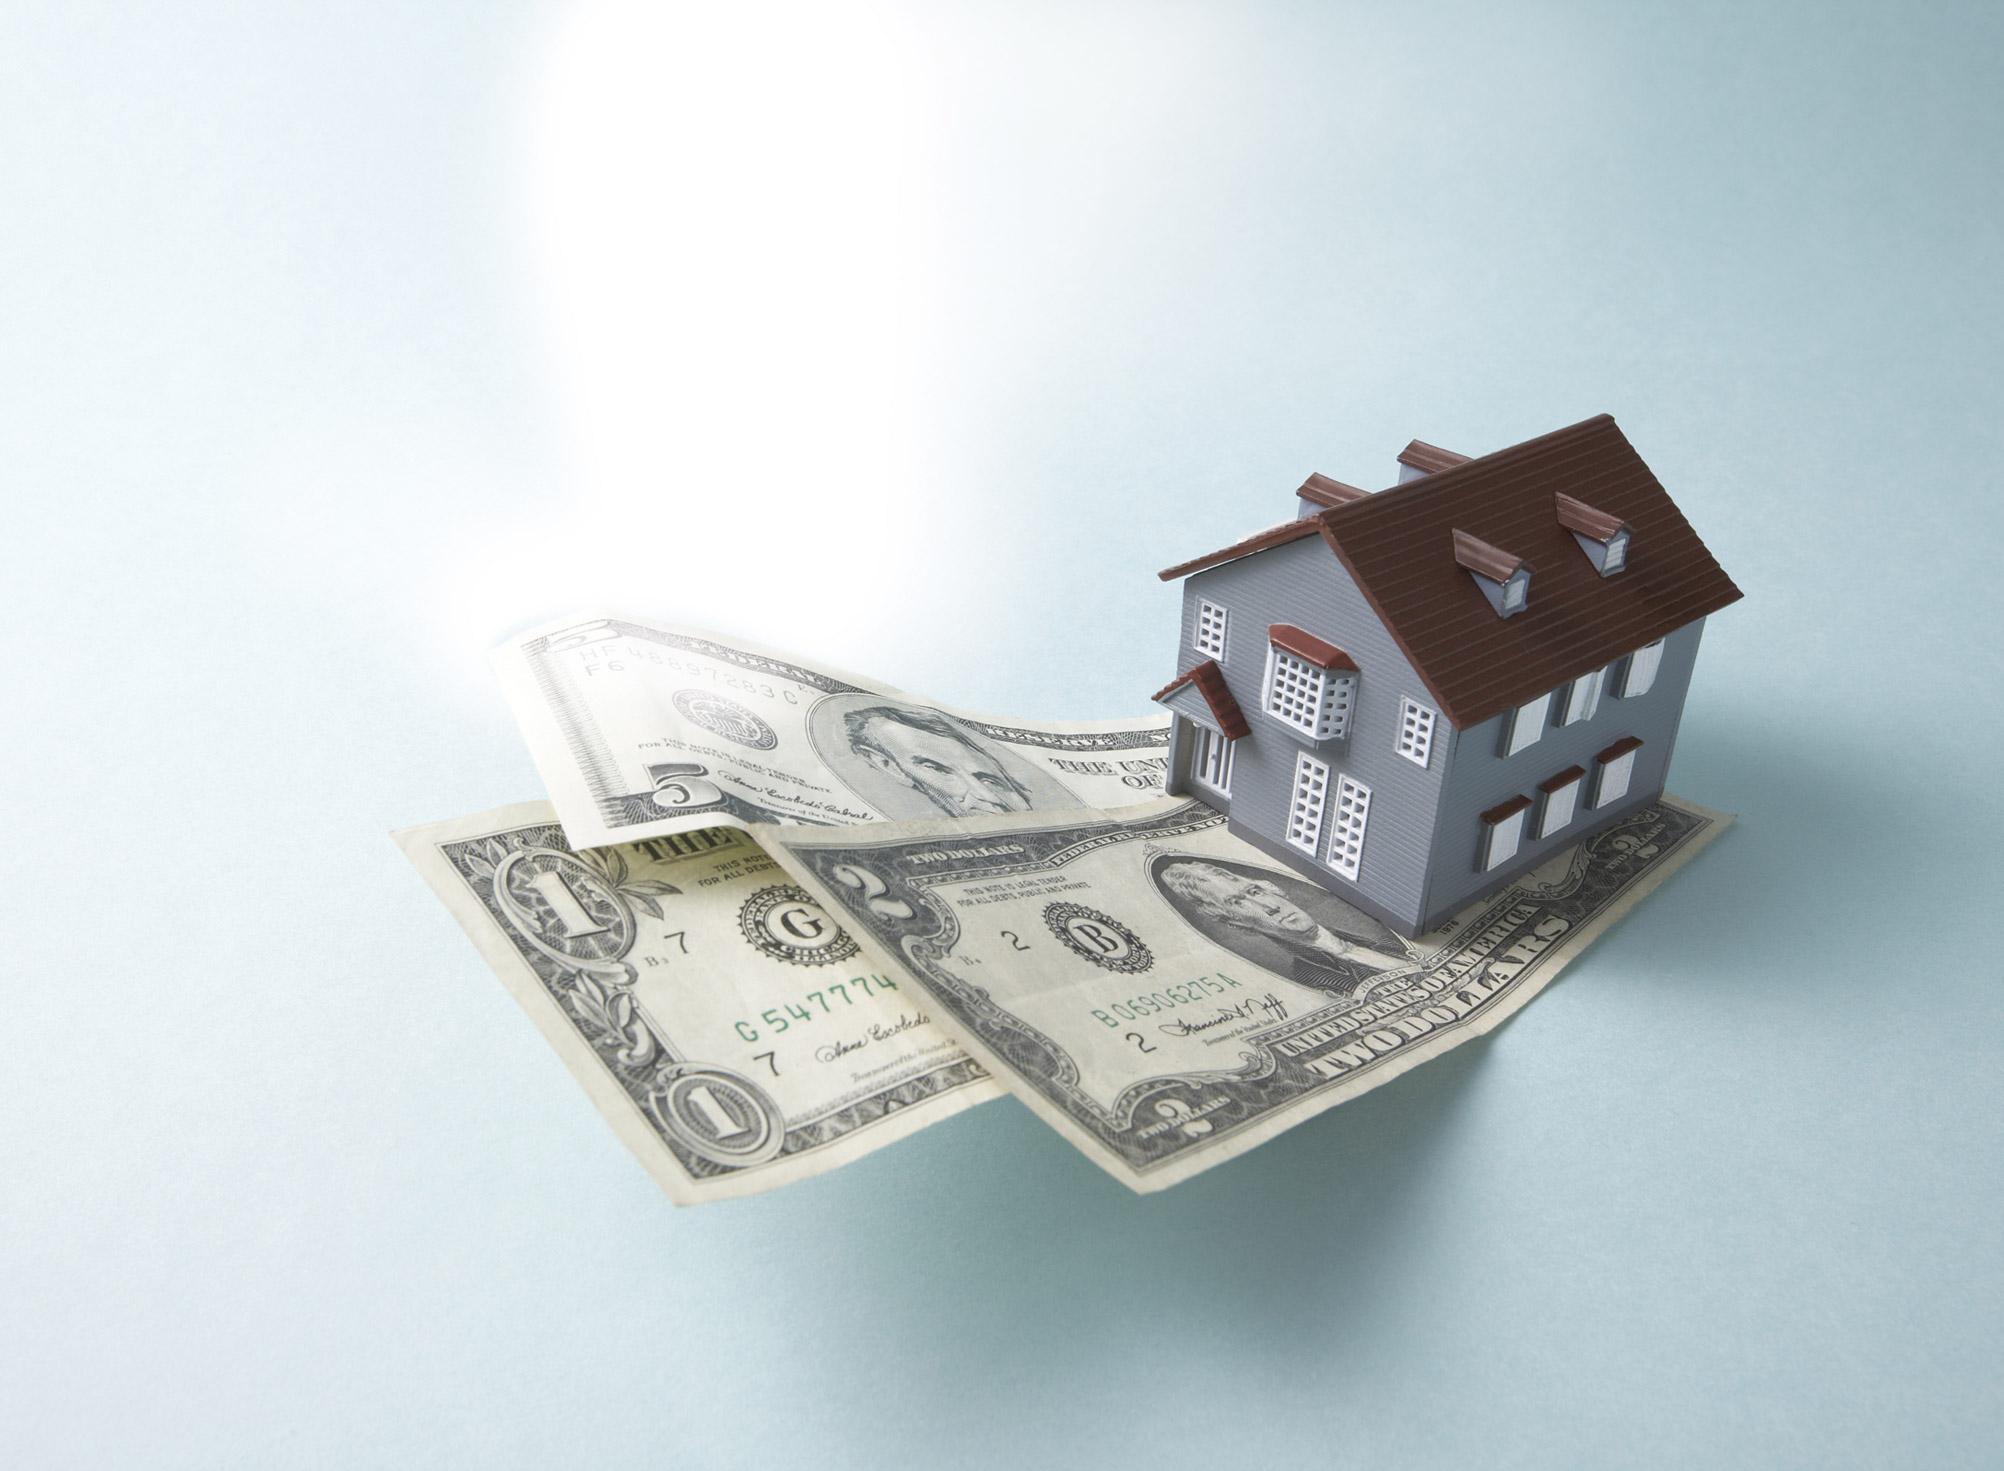 money_house_bills